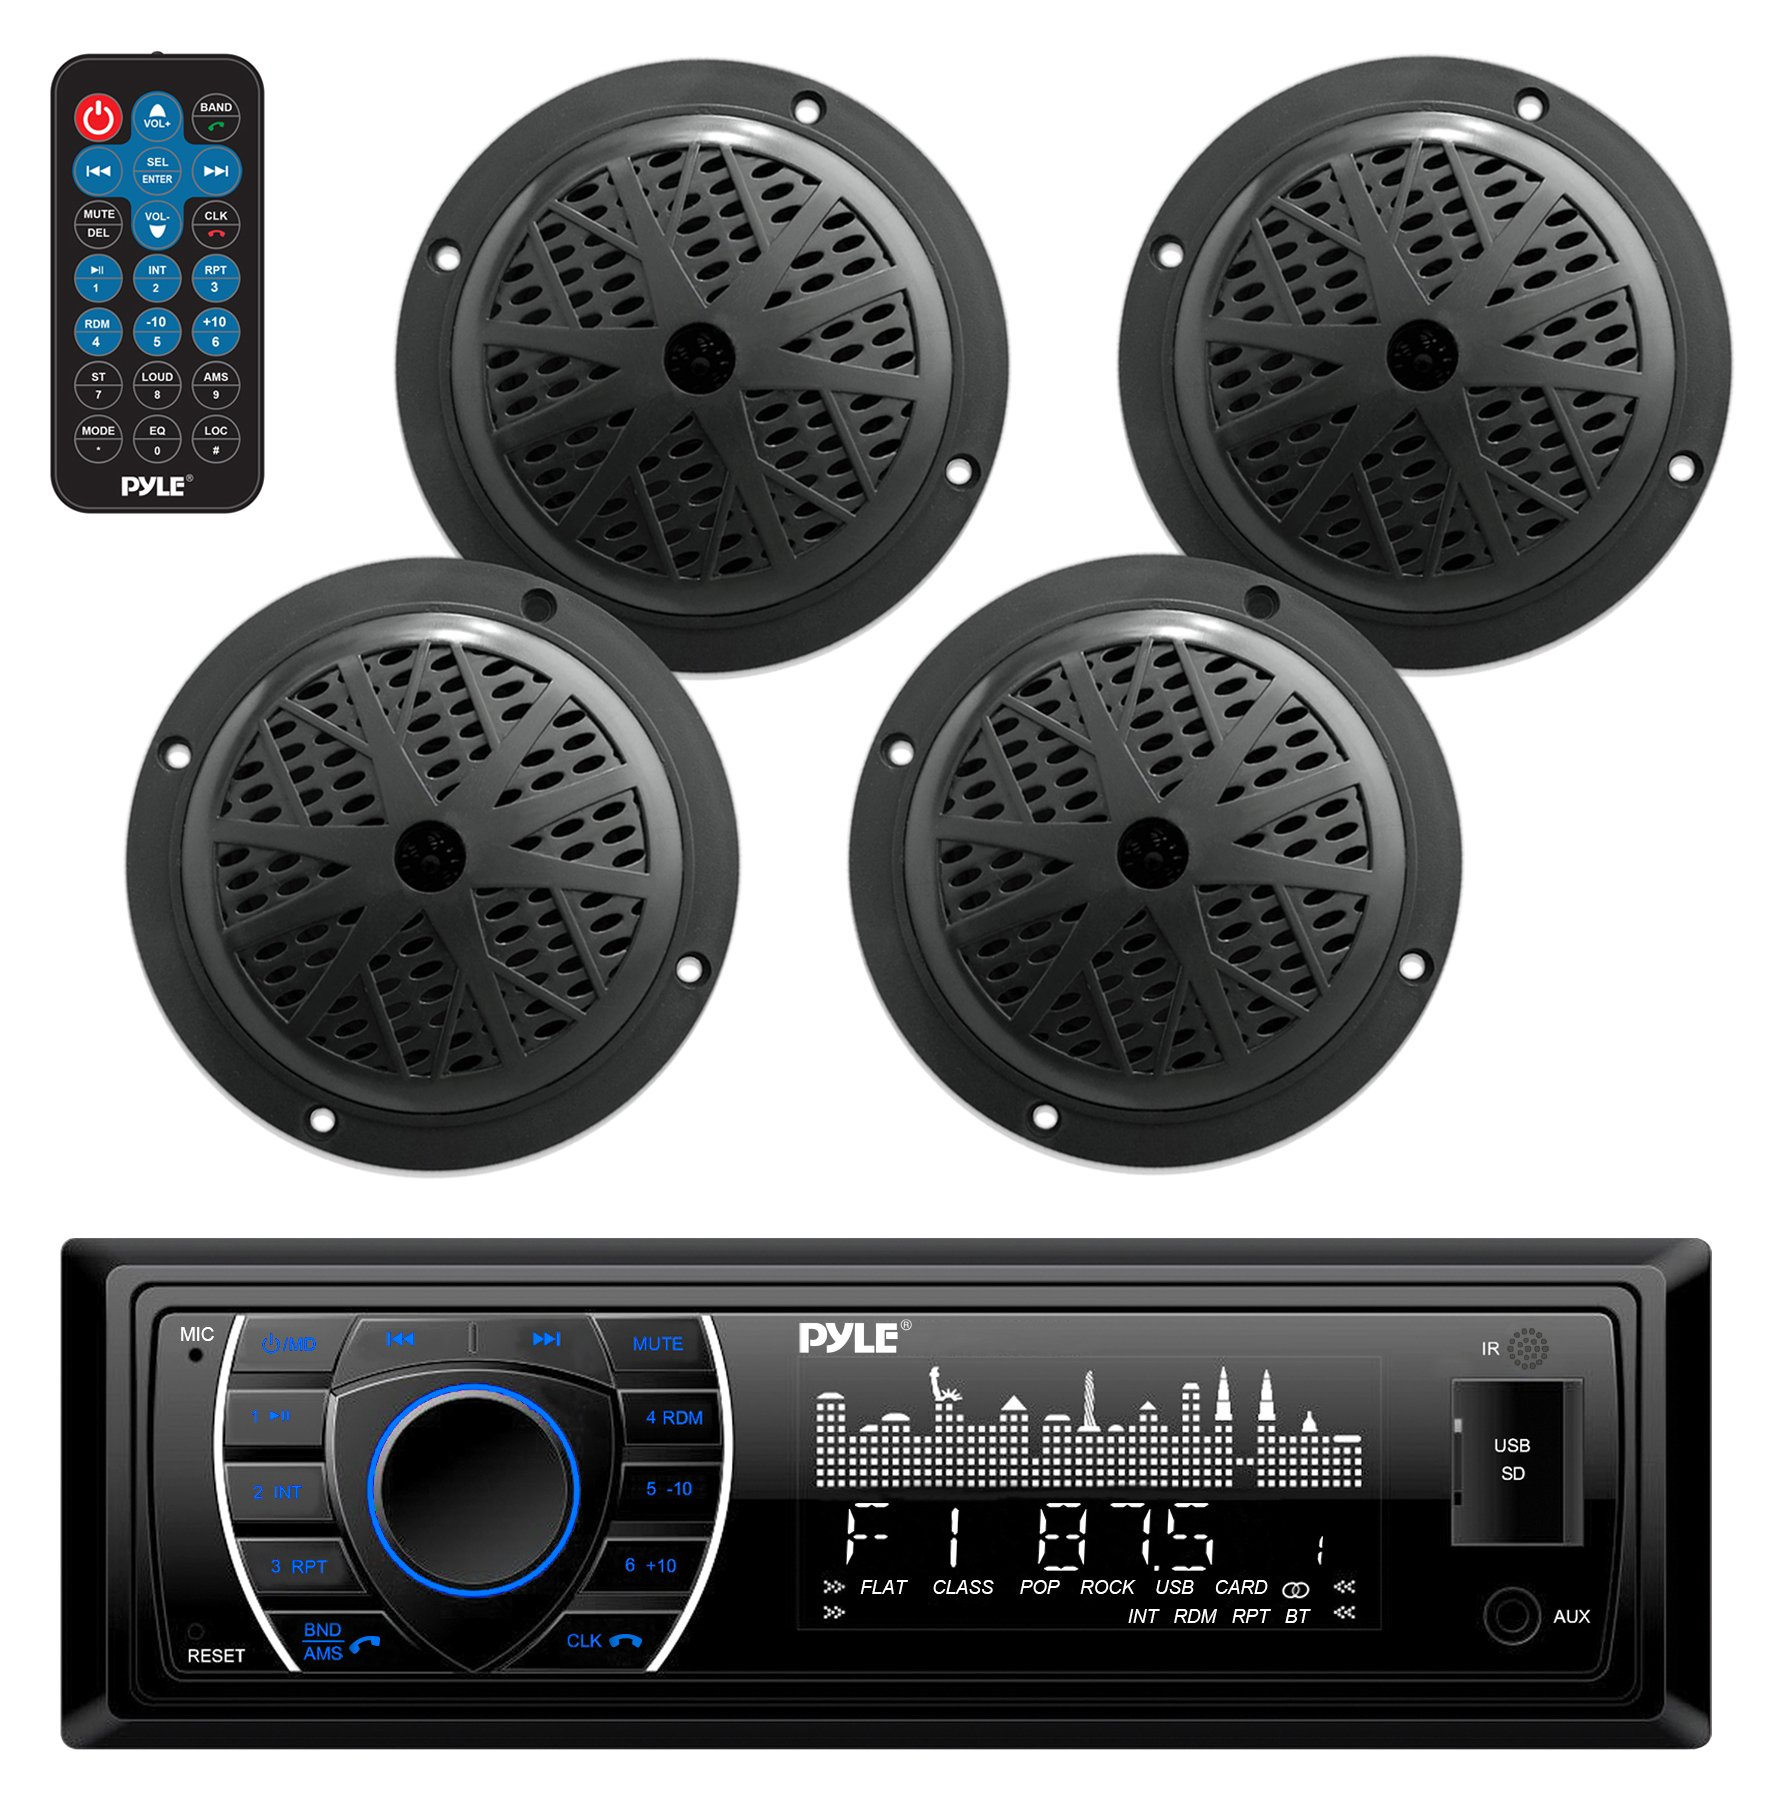 Marine Head Unit Receiver Speaker Kit - in-Dash LCD Digital Stereo Built-in Bluetooth & Microphone w/AM FM Radio System 6.5'' Waterproof Speakers (4) MP3/SD Readers & Remote Control - Pyle PLMRKT48BK